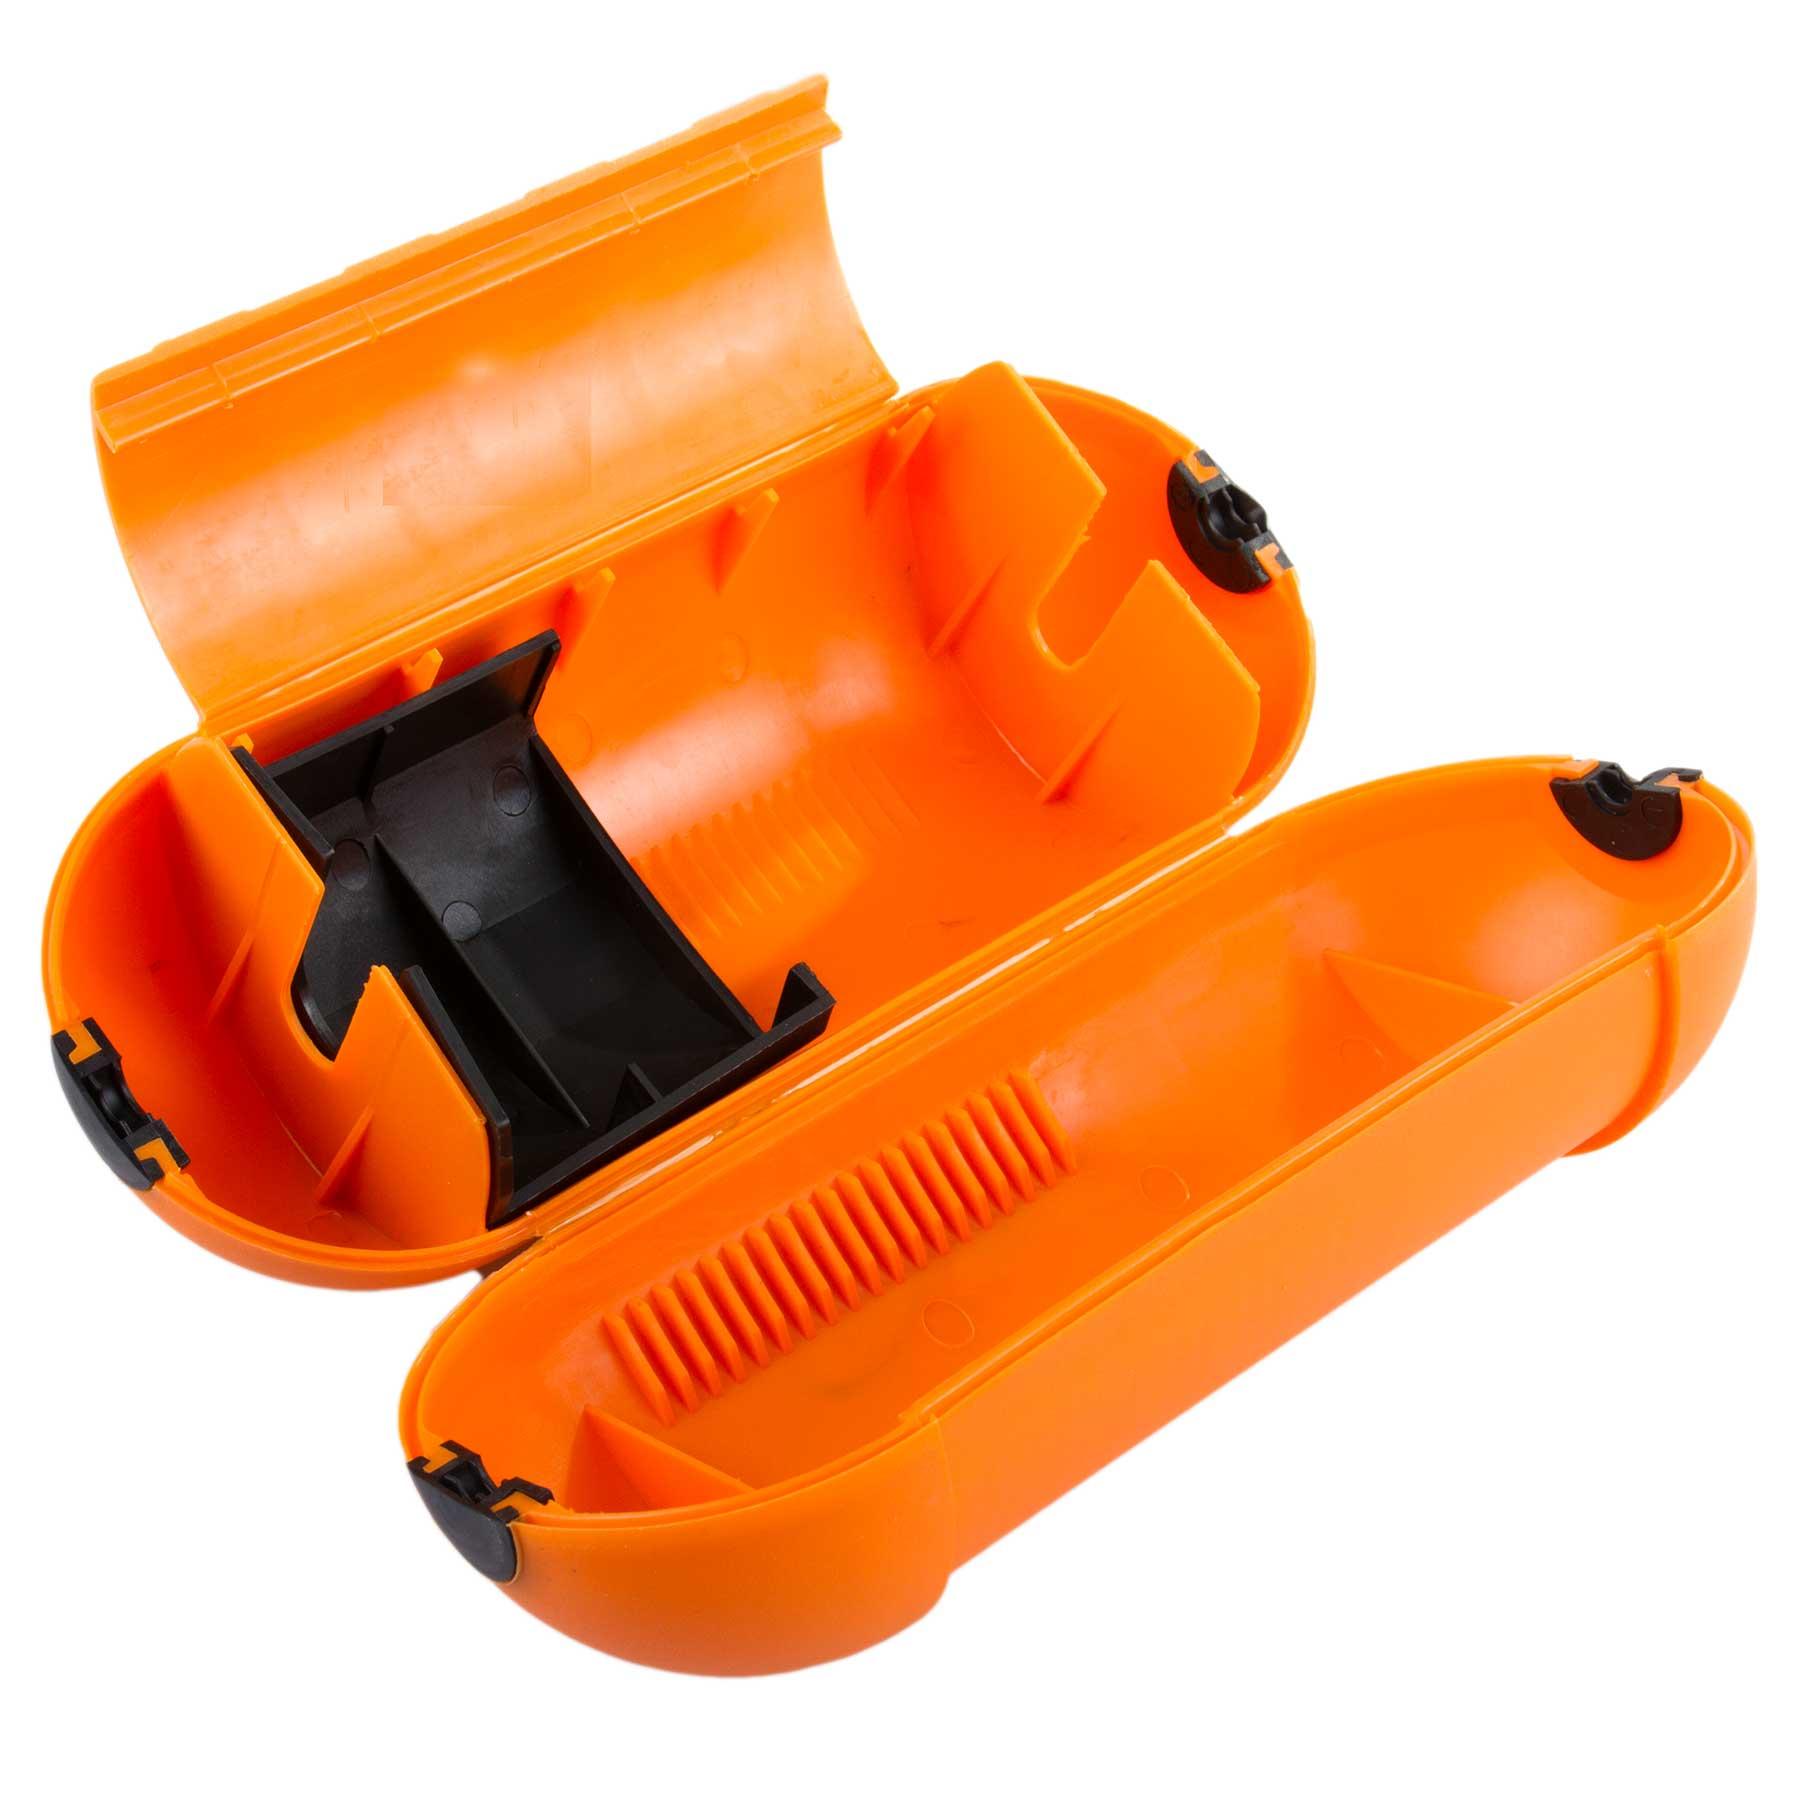 masterplug spto mp splashproof socket protector masterplug spto mp splashproof socket. Black Bedroom Furniture Sets. Home Design Ideas